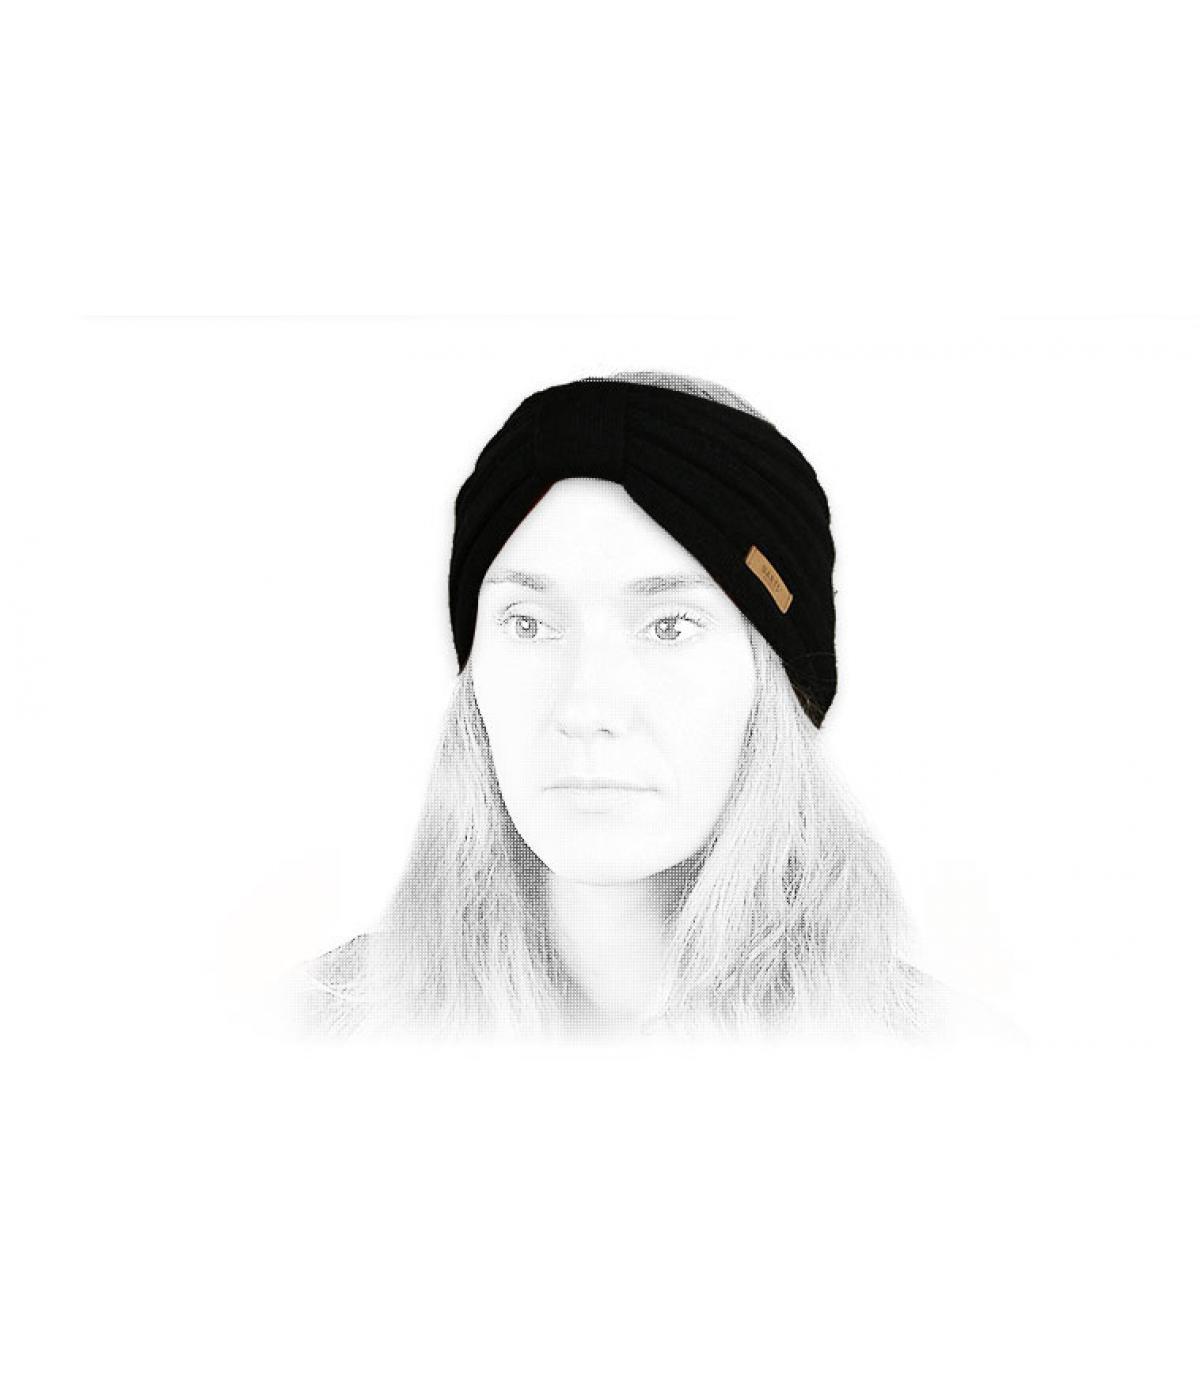 Detalles Zitoun Headband black imagen 4